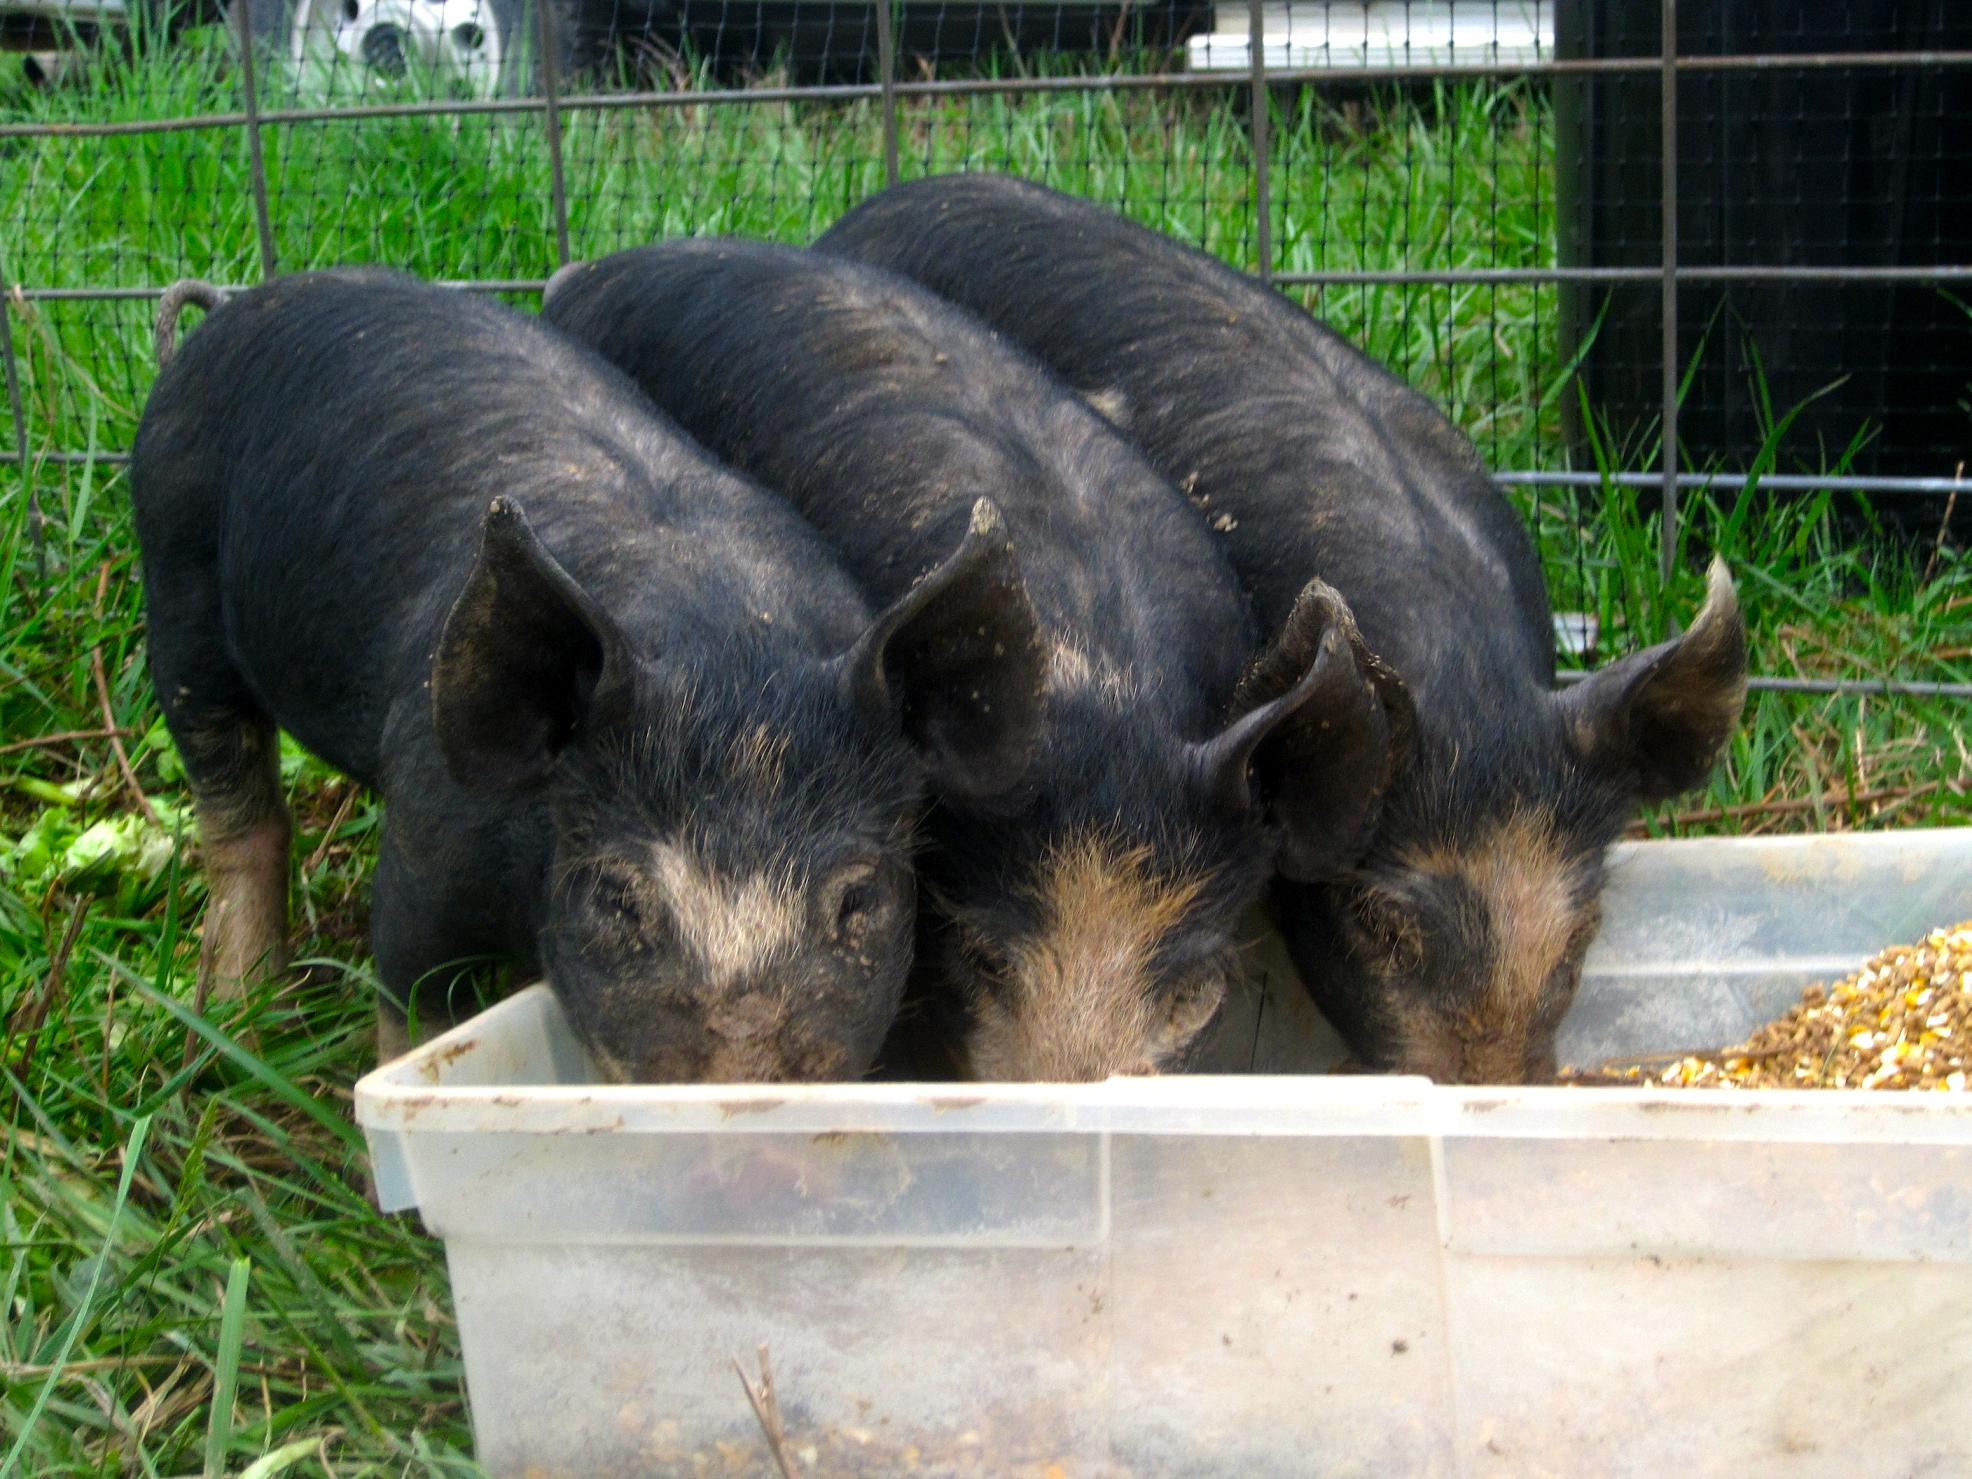 Salad Garden pigs